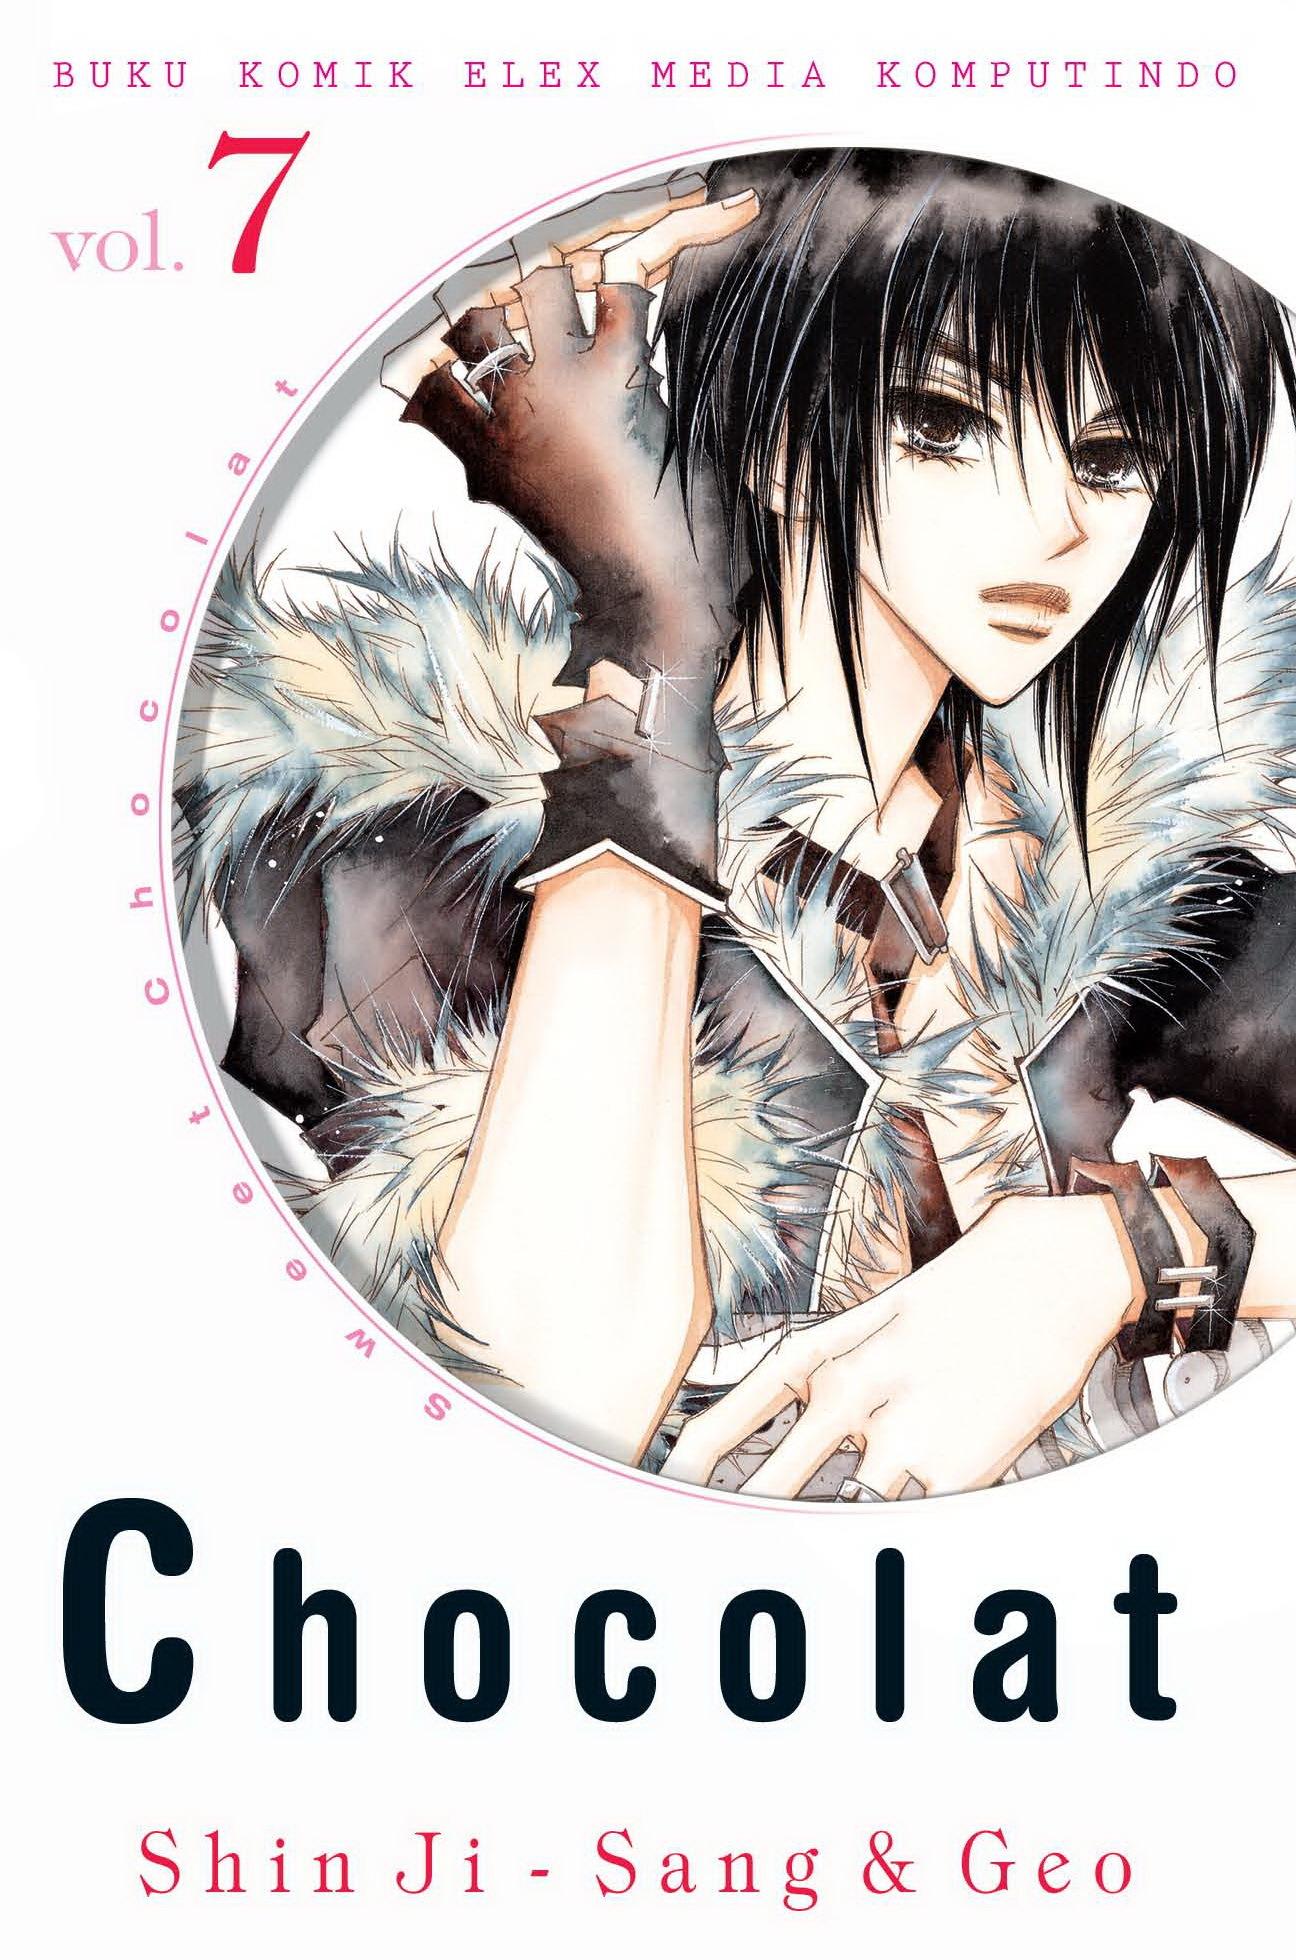 Chocolat vol. 07 (Chocolat, #7) Shin Ji-Sang